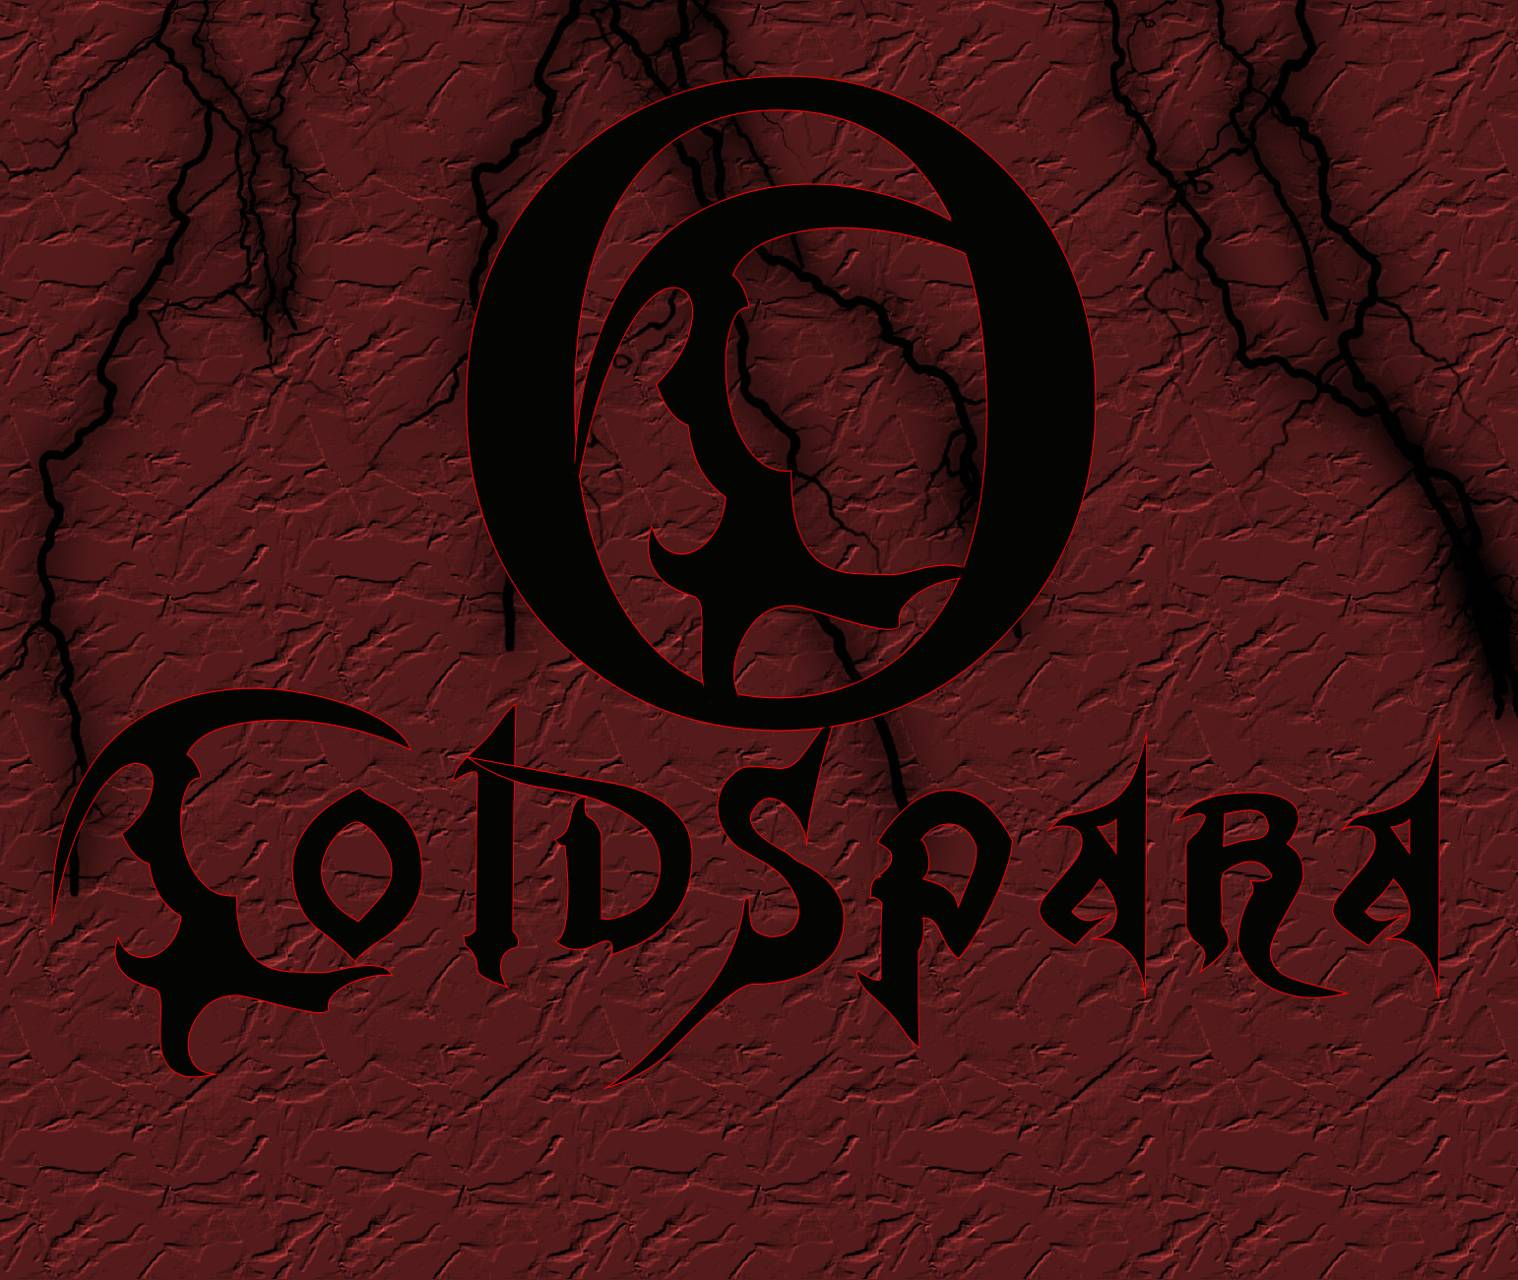 Coldspara Wallpaper